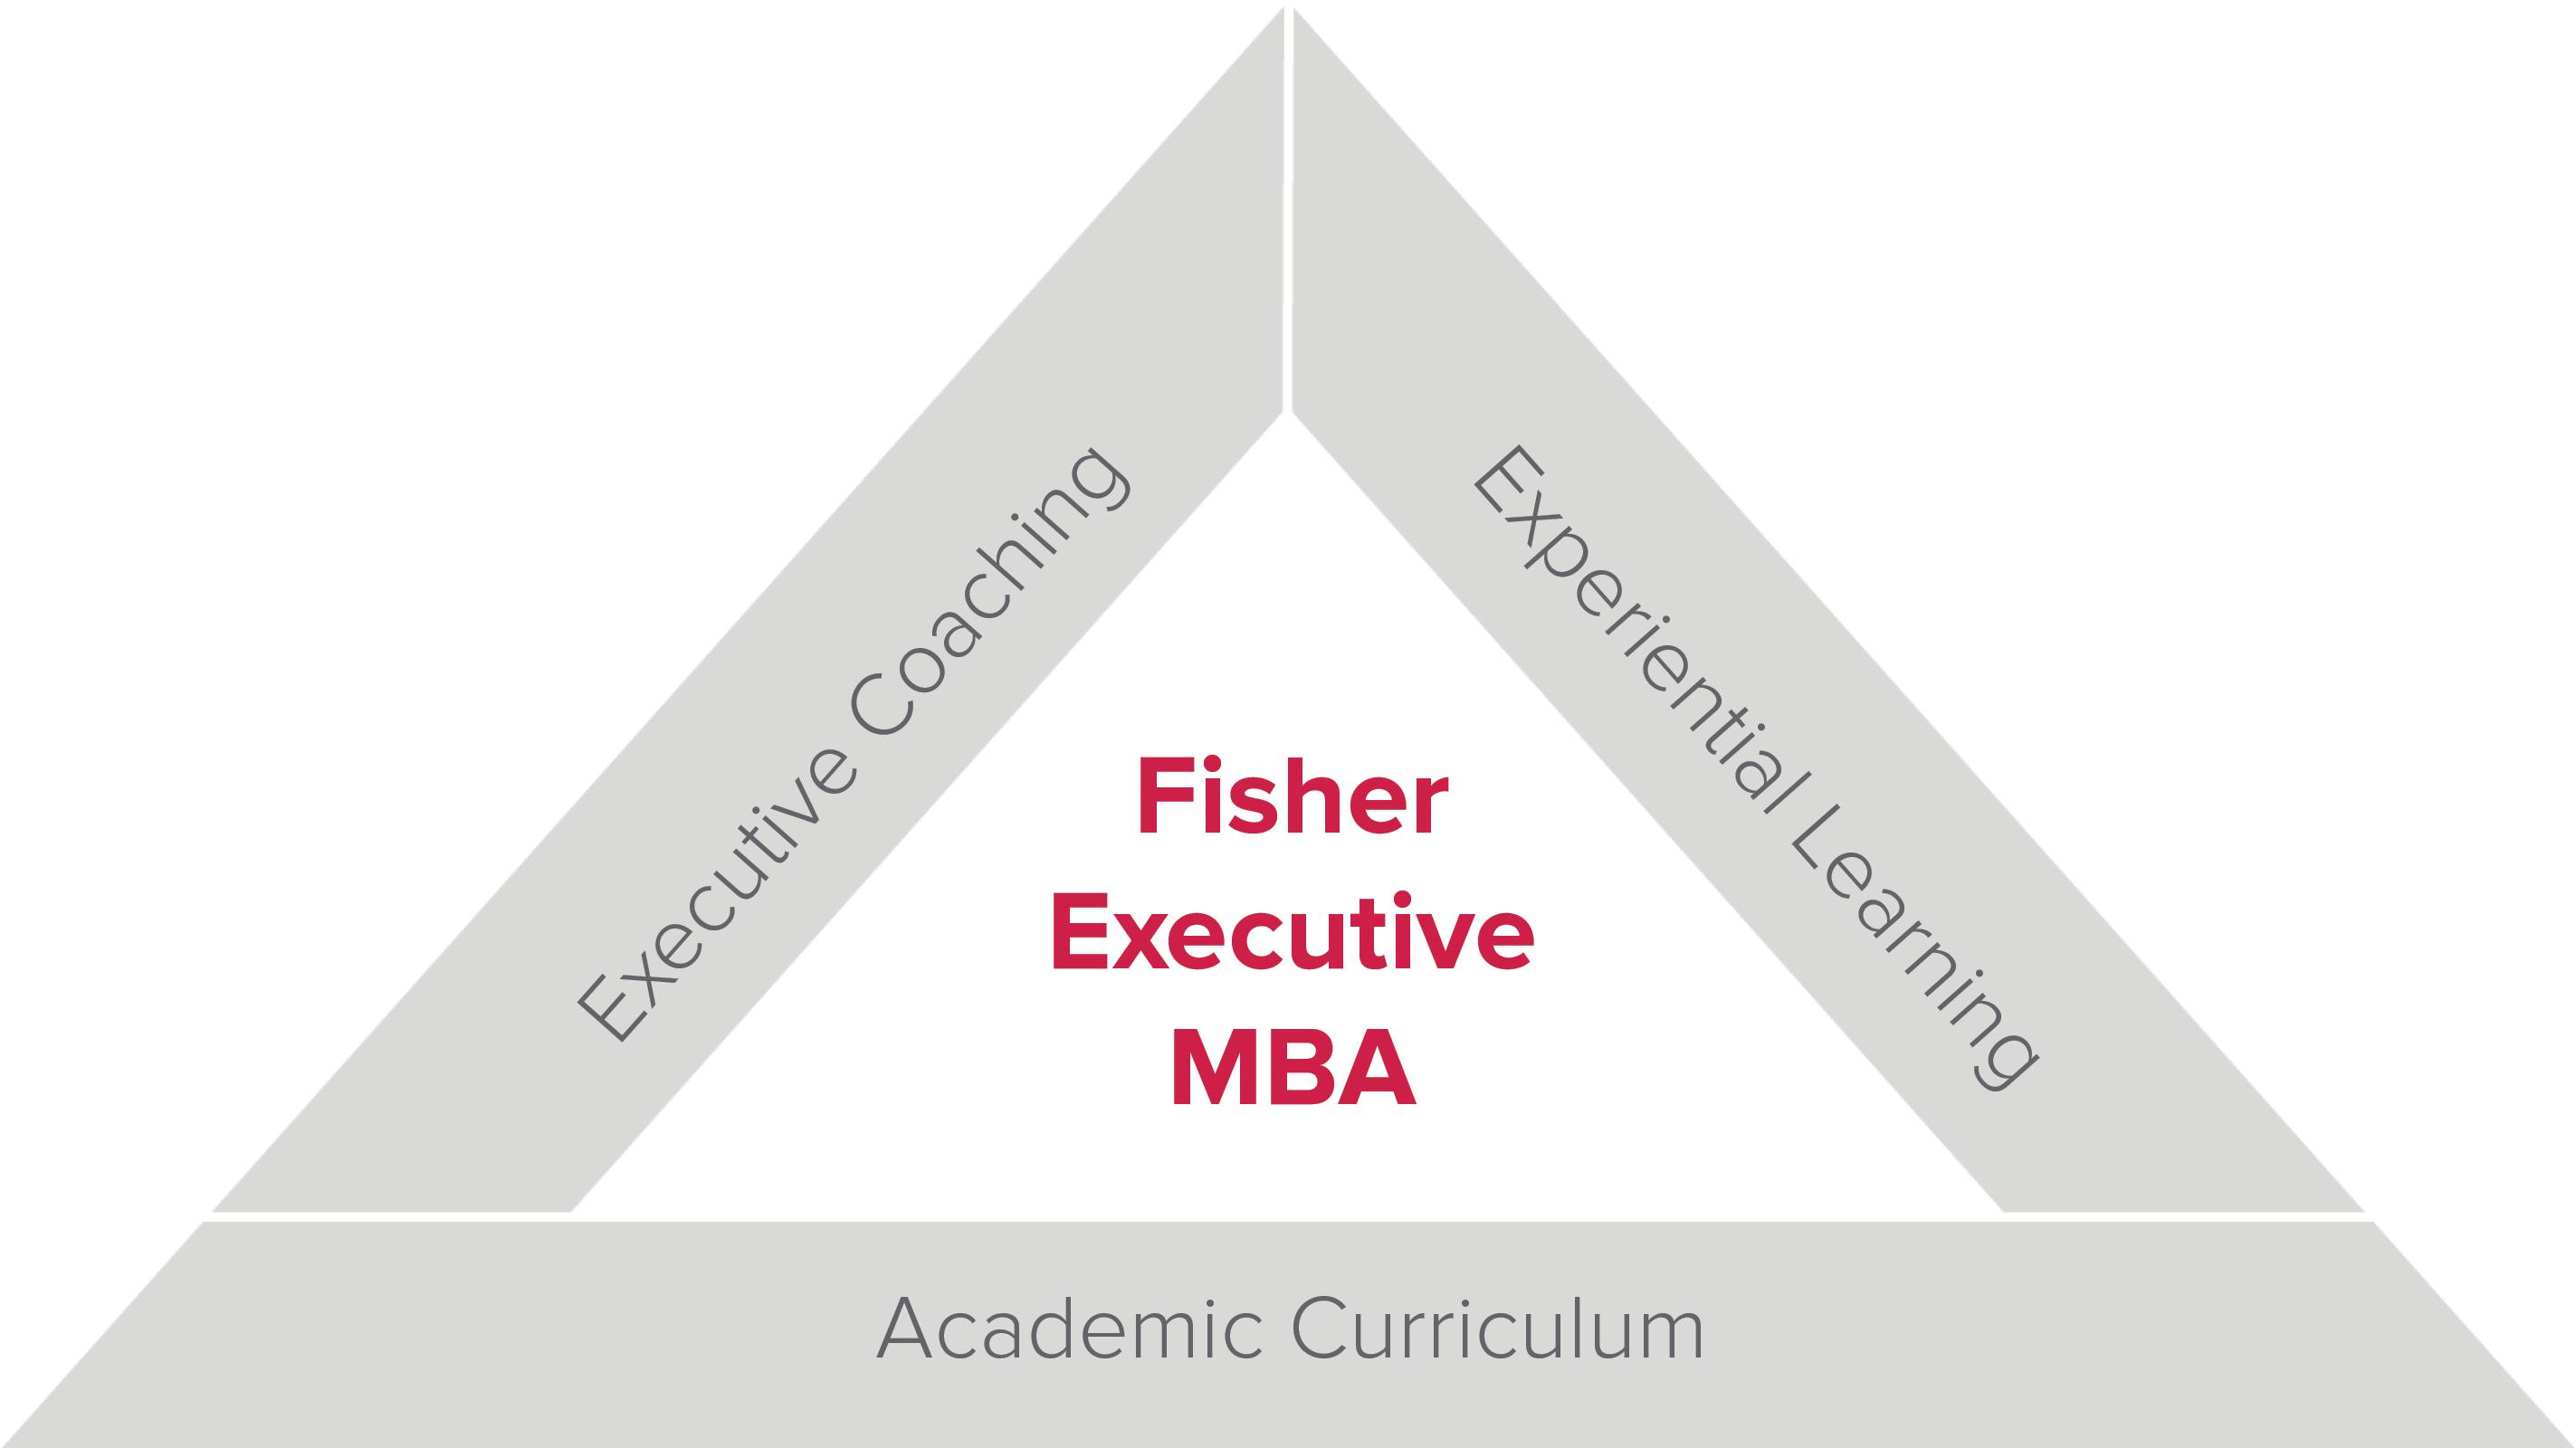 Fisher Executive MBA triad